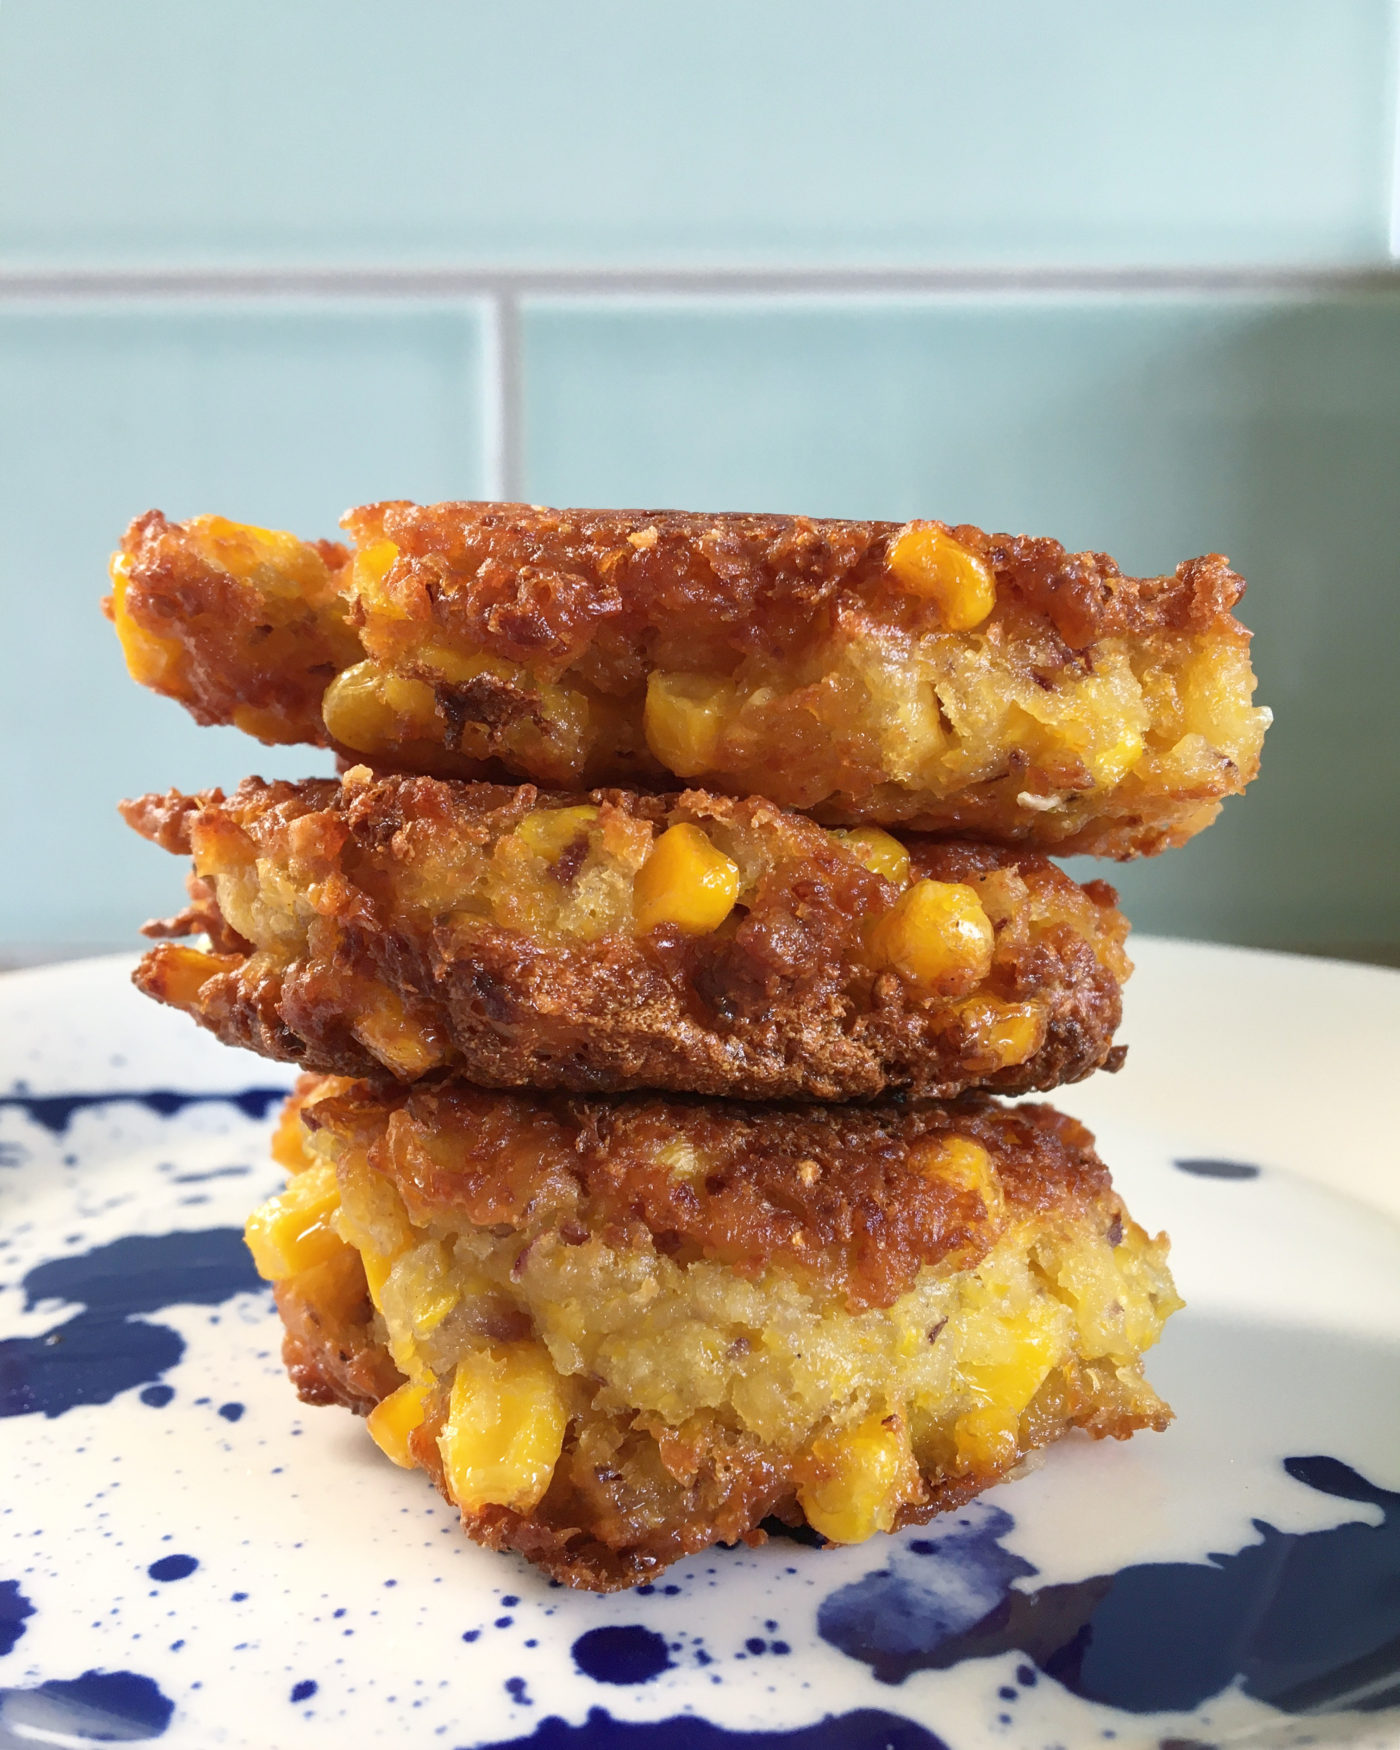 Sweetcorn fritter recipe